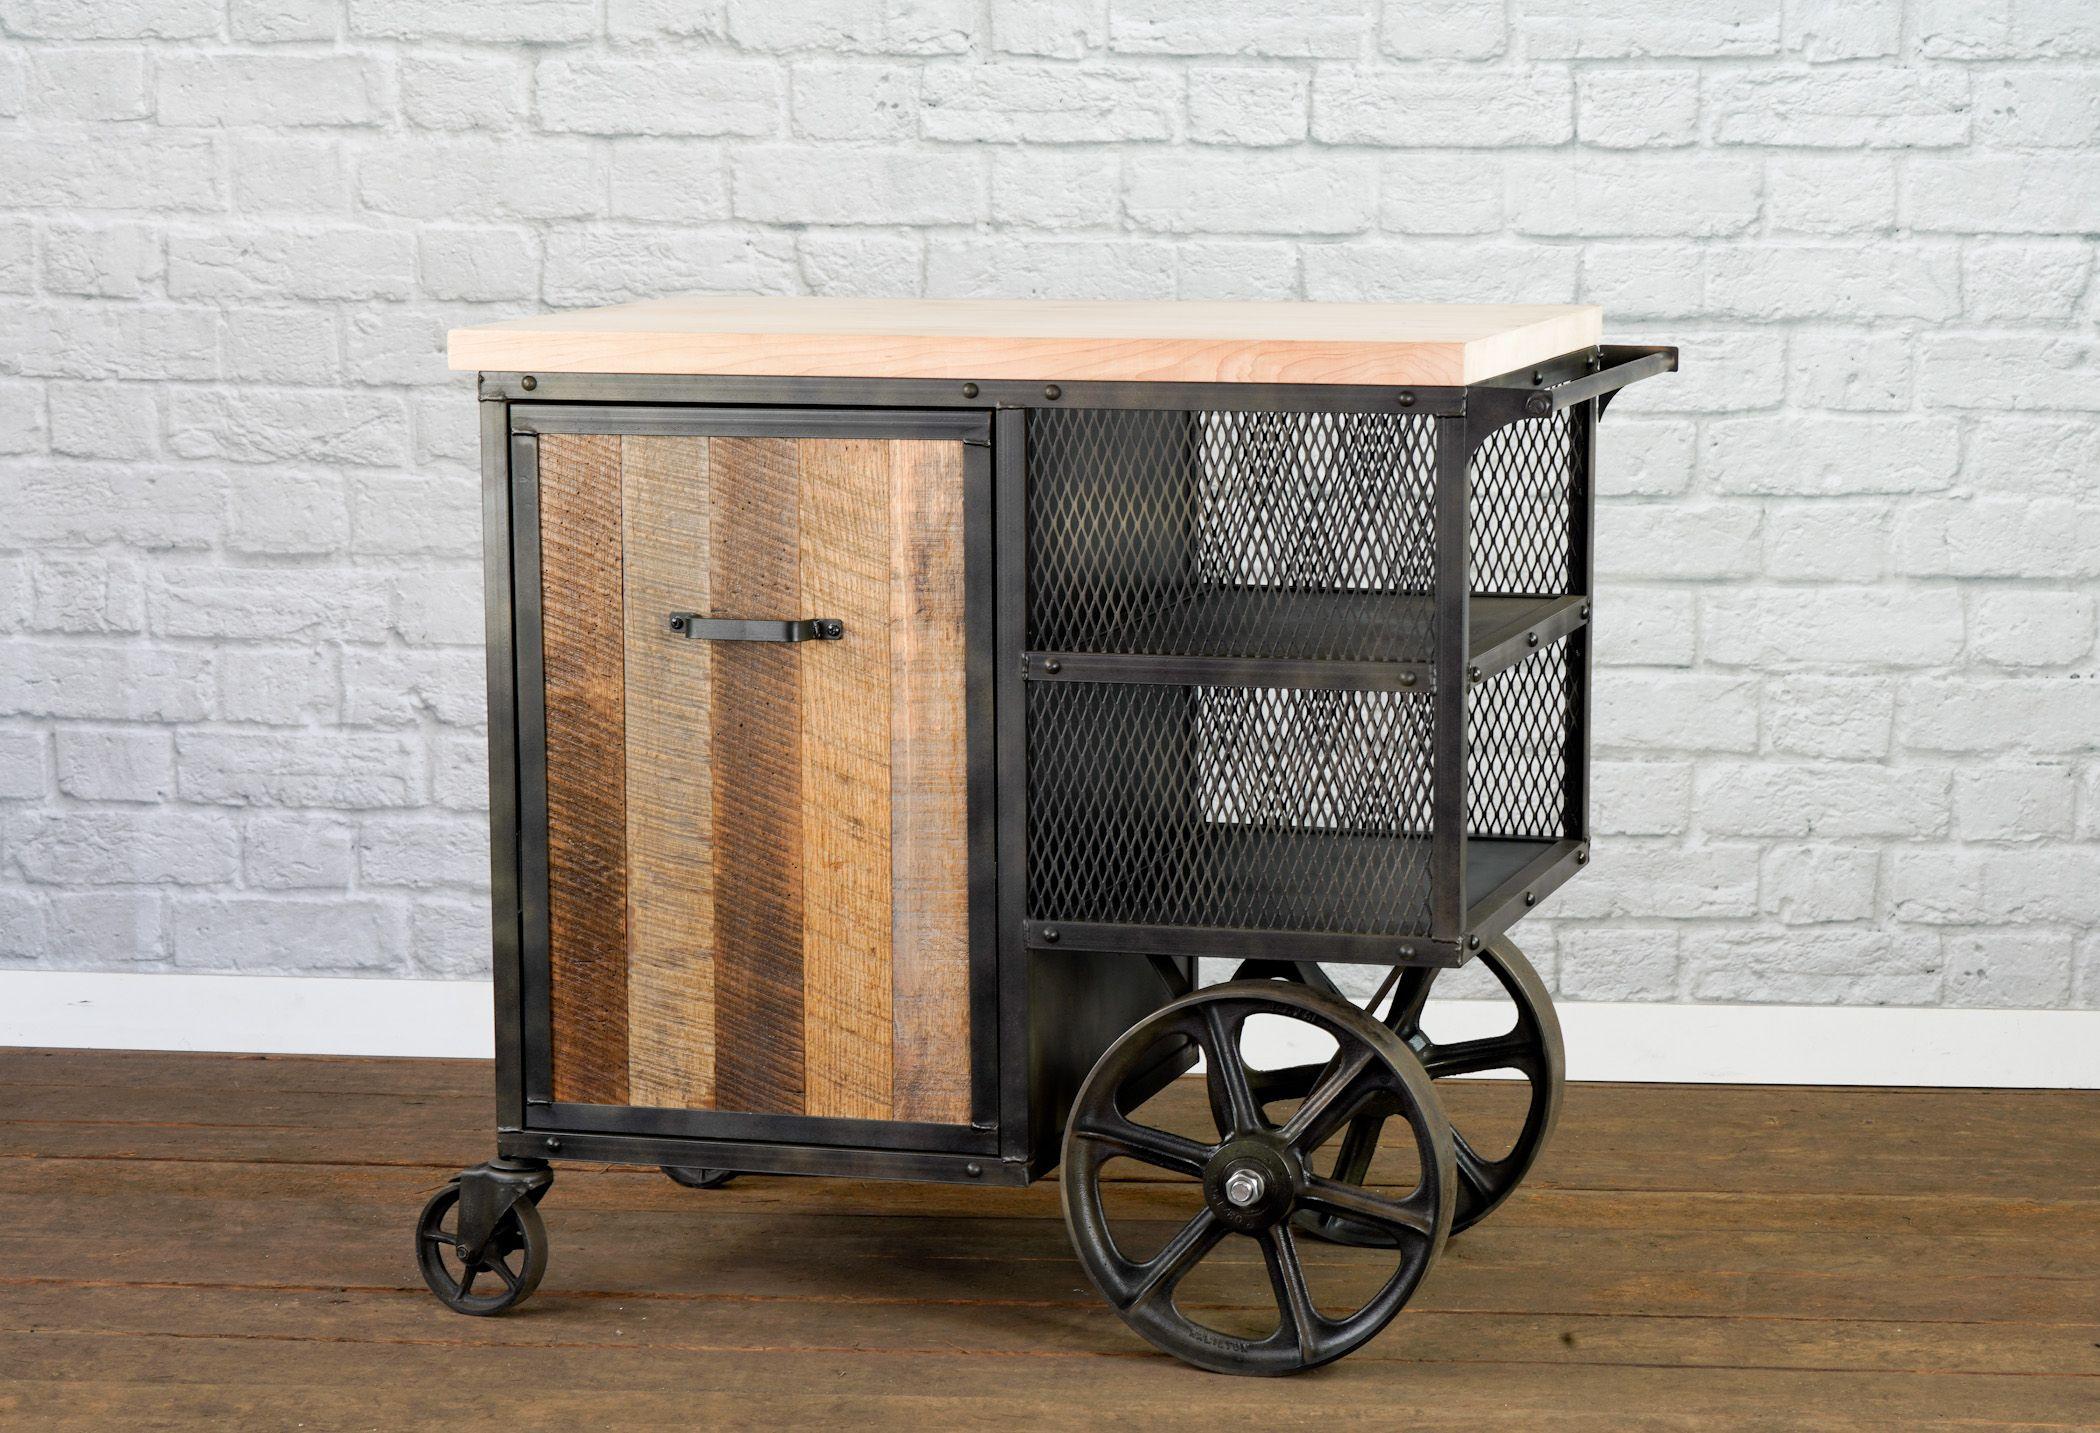 kitchen island modern bar cart service cart reclaimed wood kitchen island reclaimed wood on kitchen island ideas kitchen bar carts id=55998